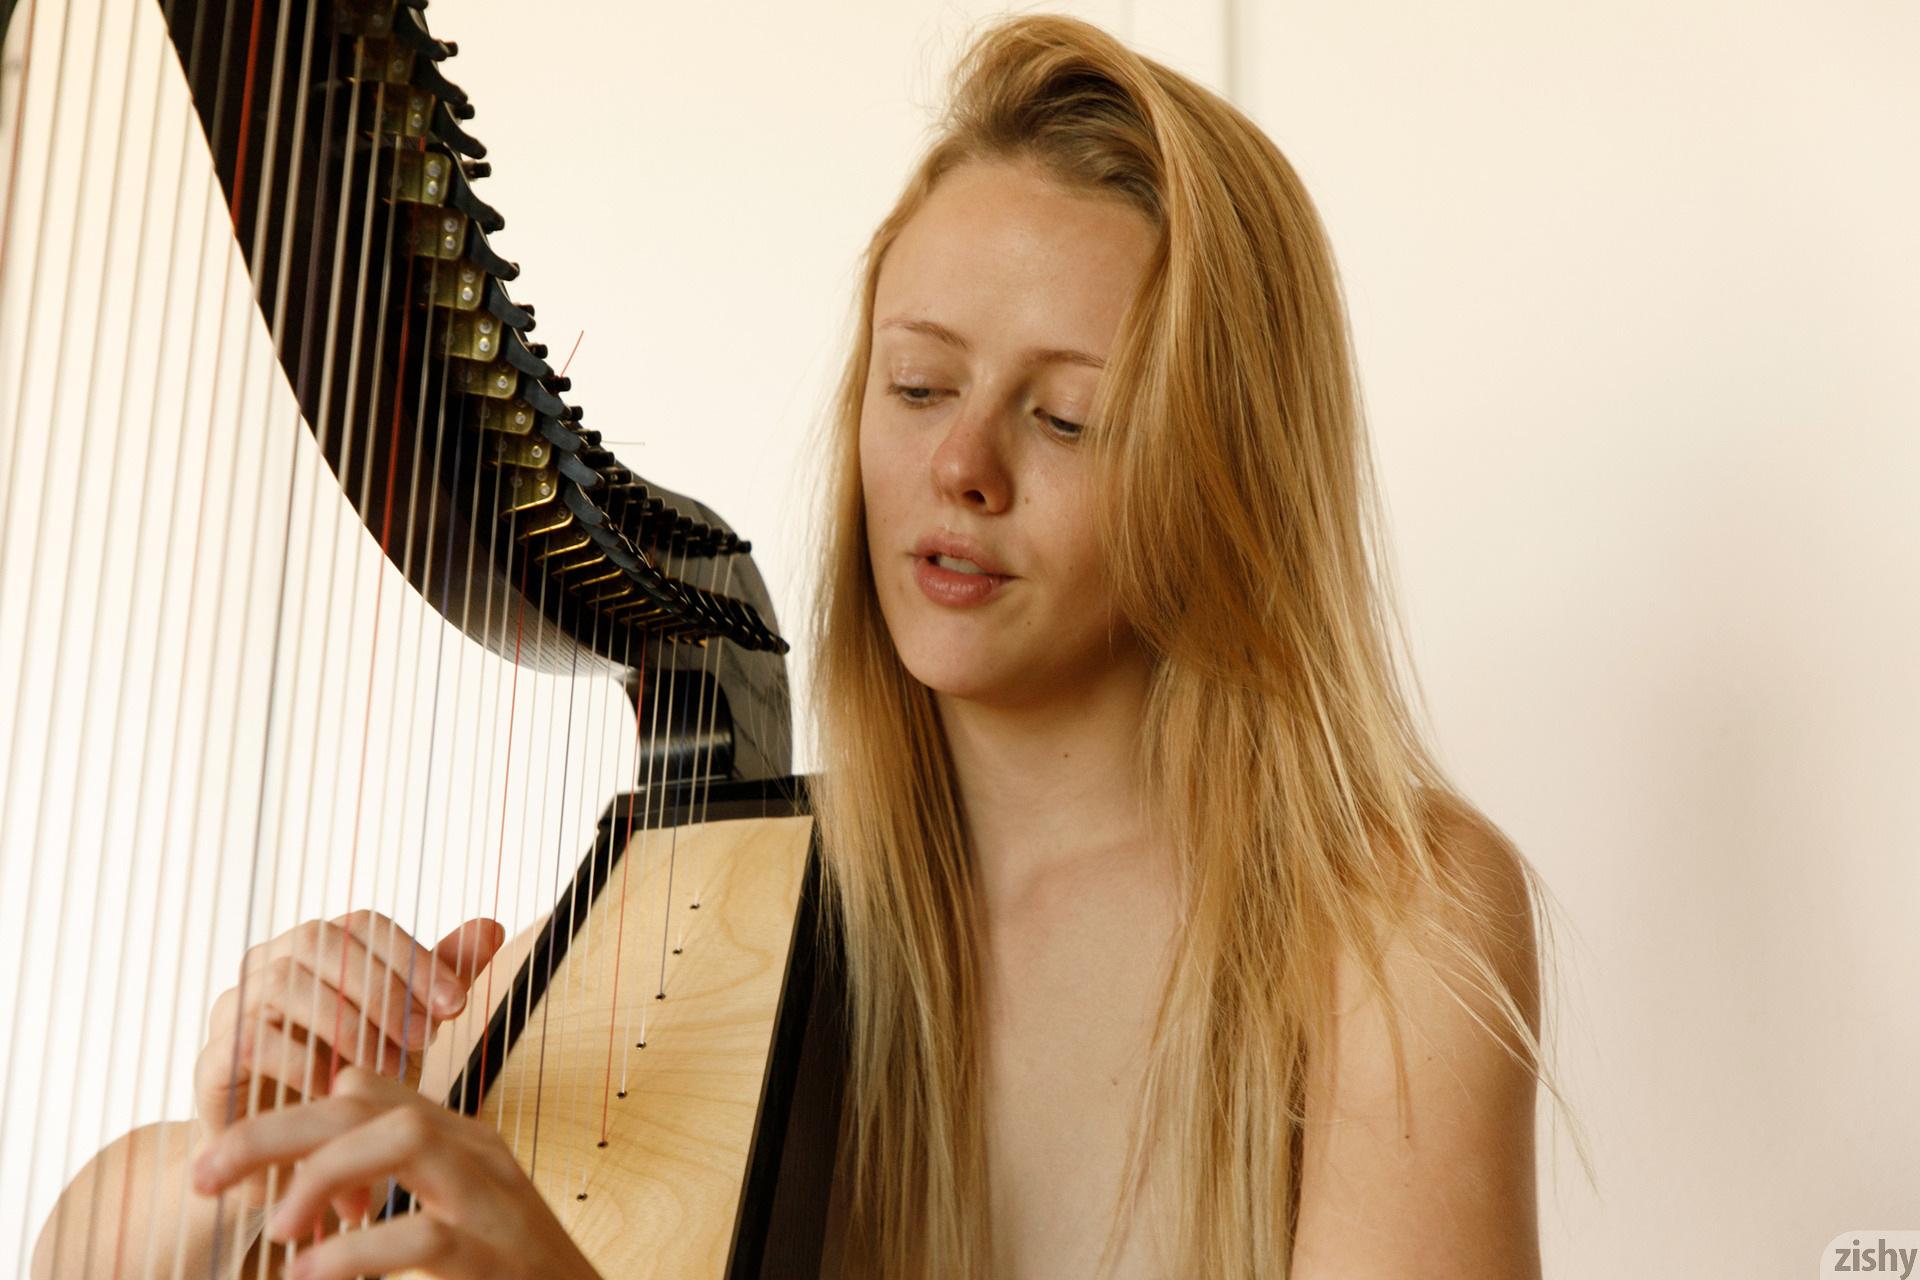 Helen Bergstrom Show Me Your Strings Zishy (15)